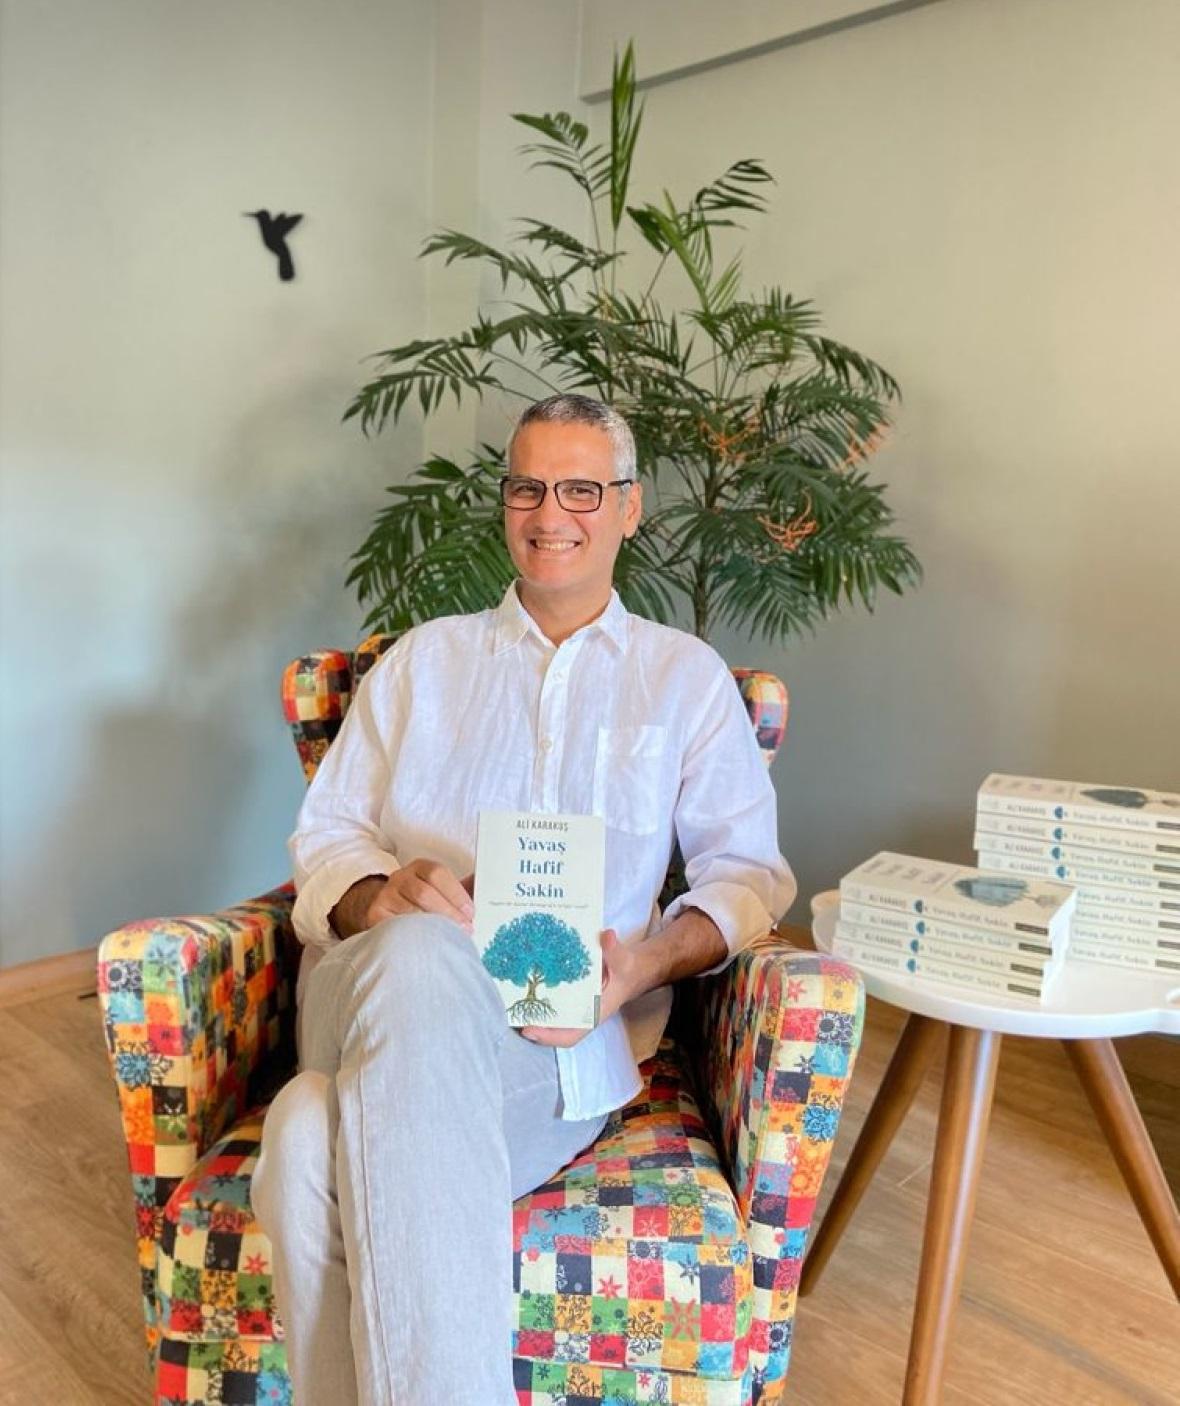 Yazar Ali Karakuş'tan 'Yavaş, Hafif, Sakin' kitap